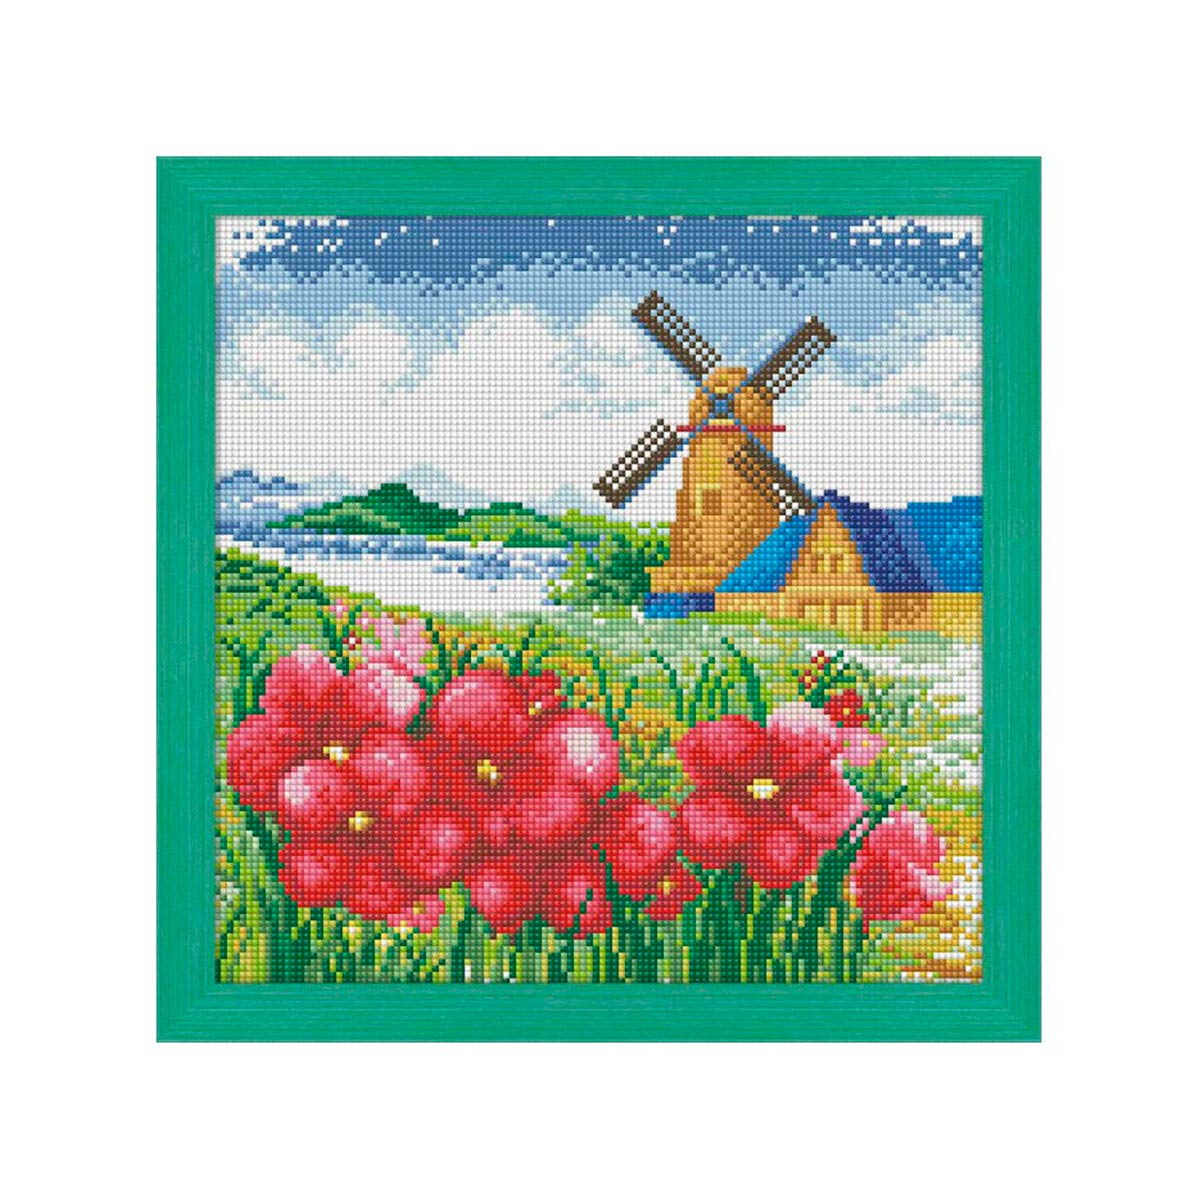 7493 Мозаика Cristal 'Мельница', 35*35 см